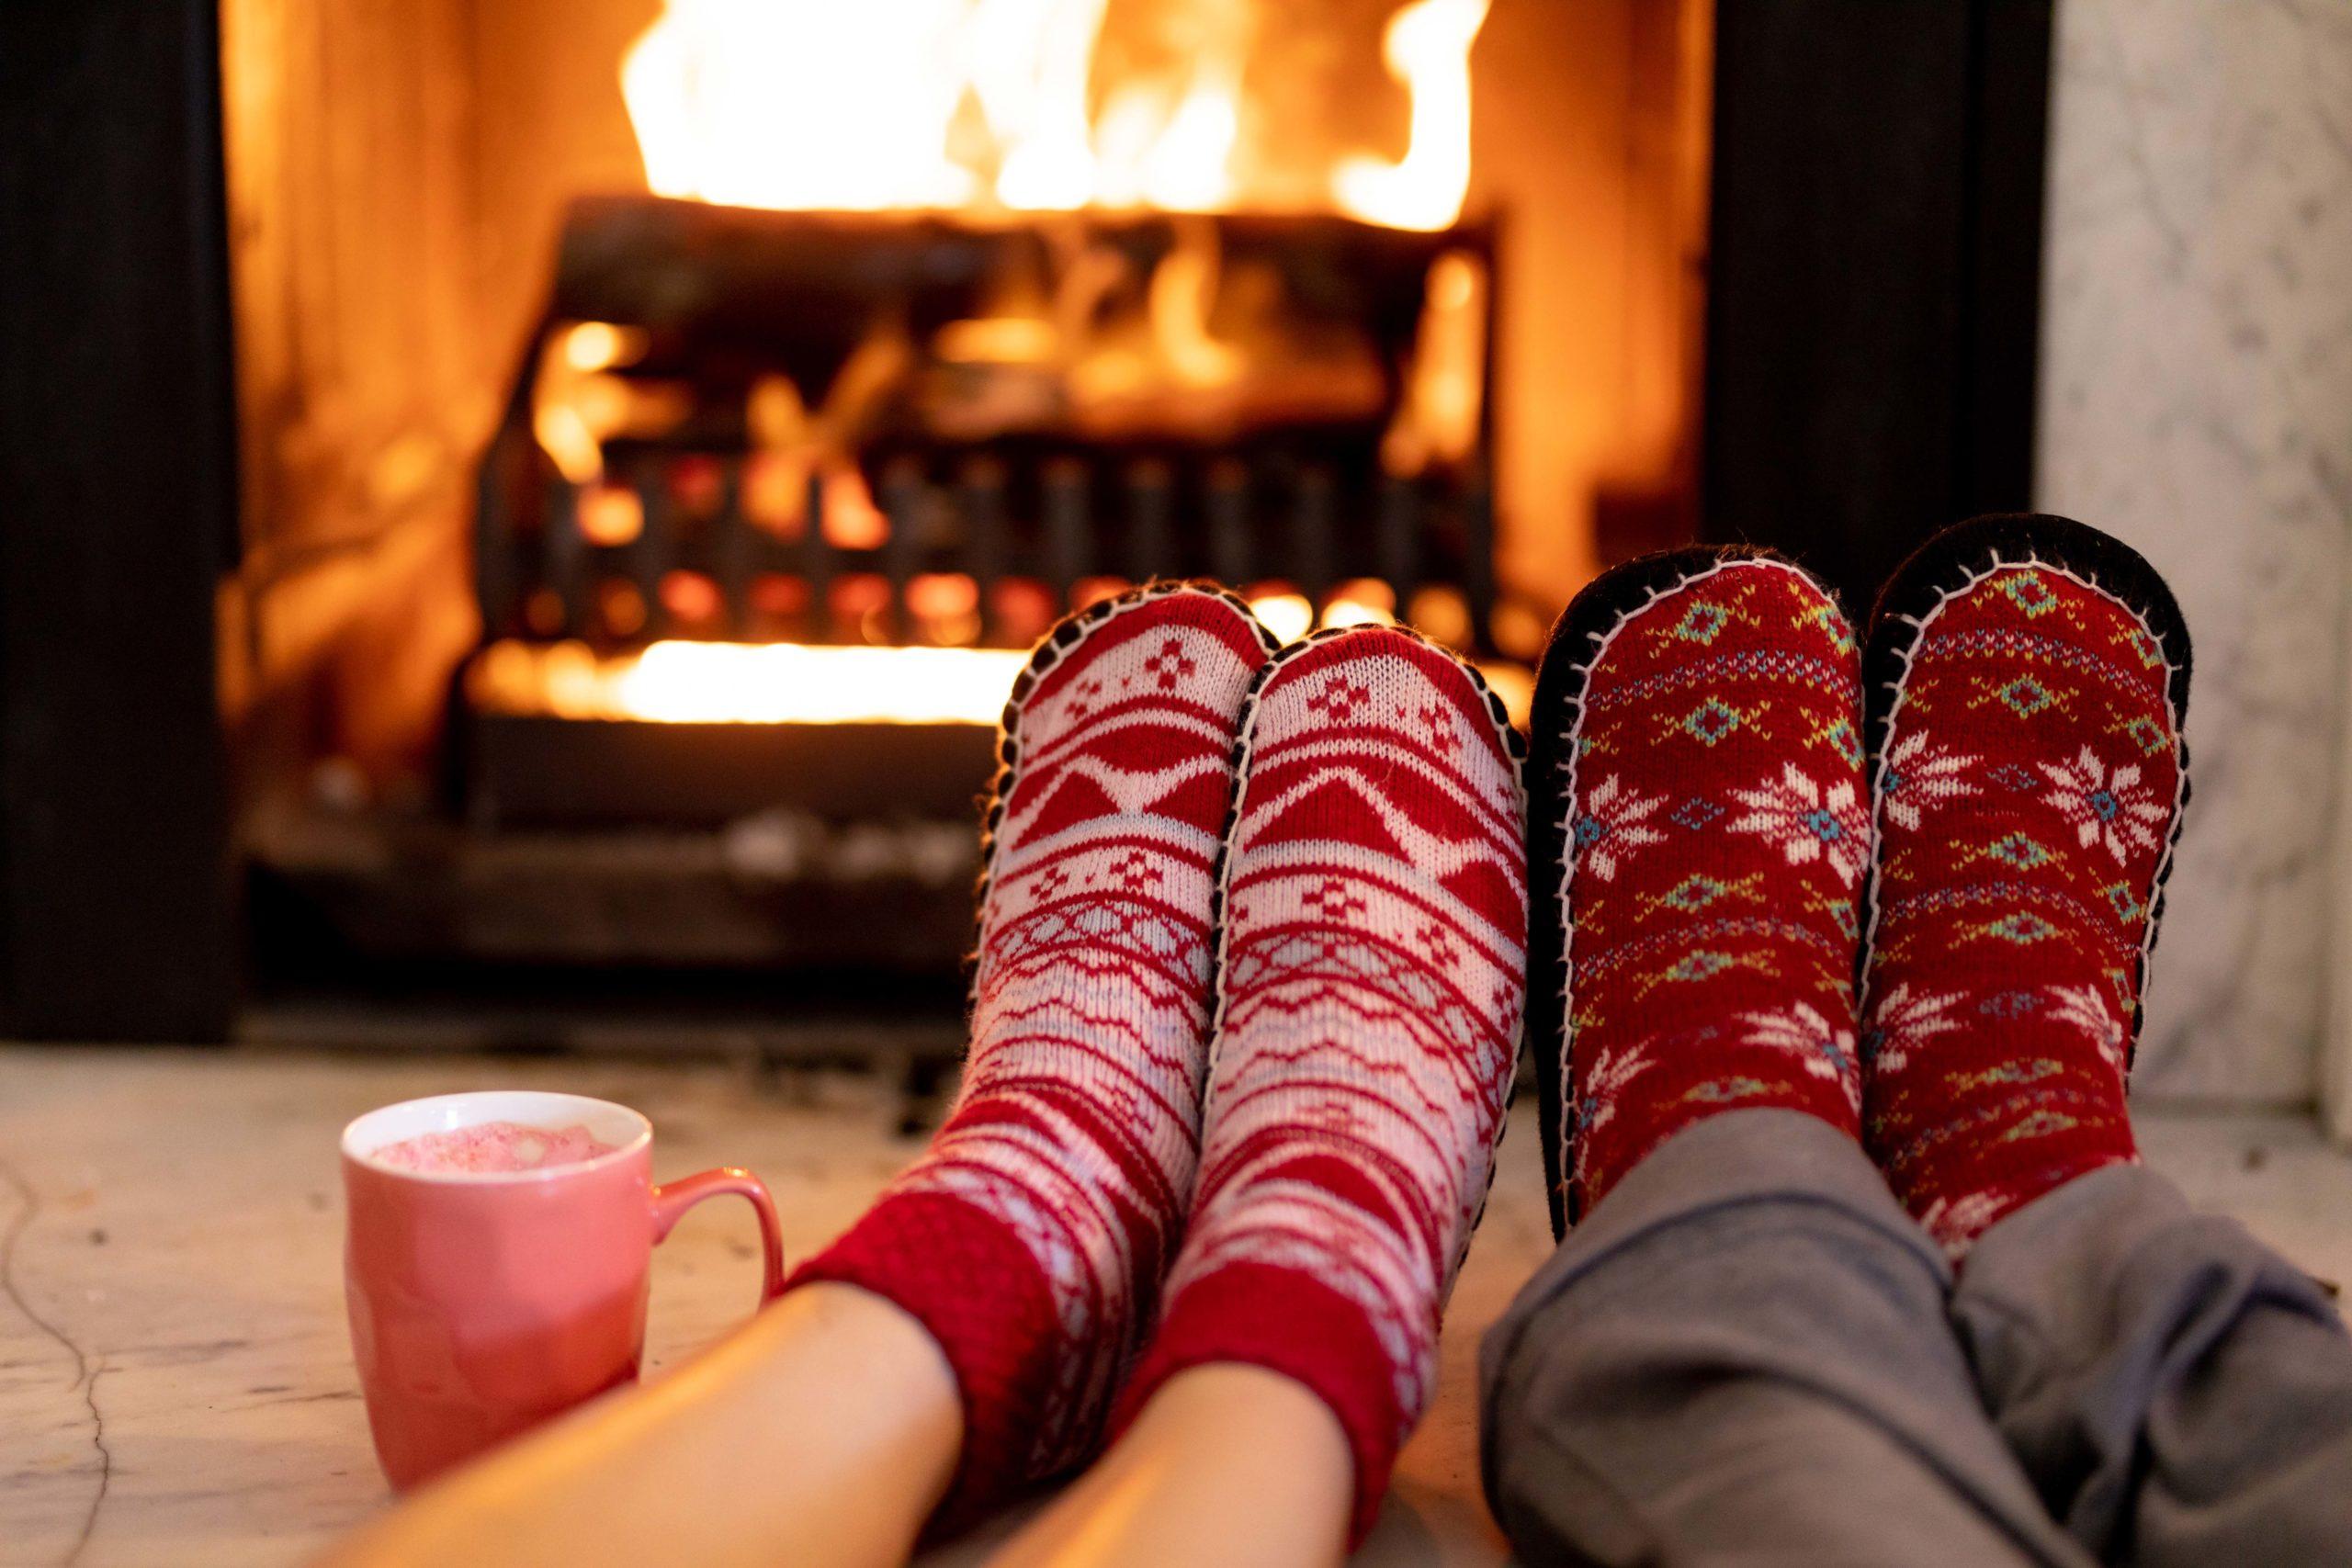 chaussons gante